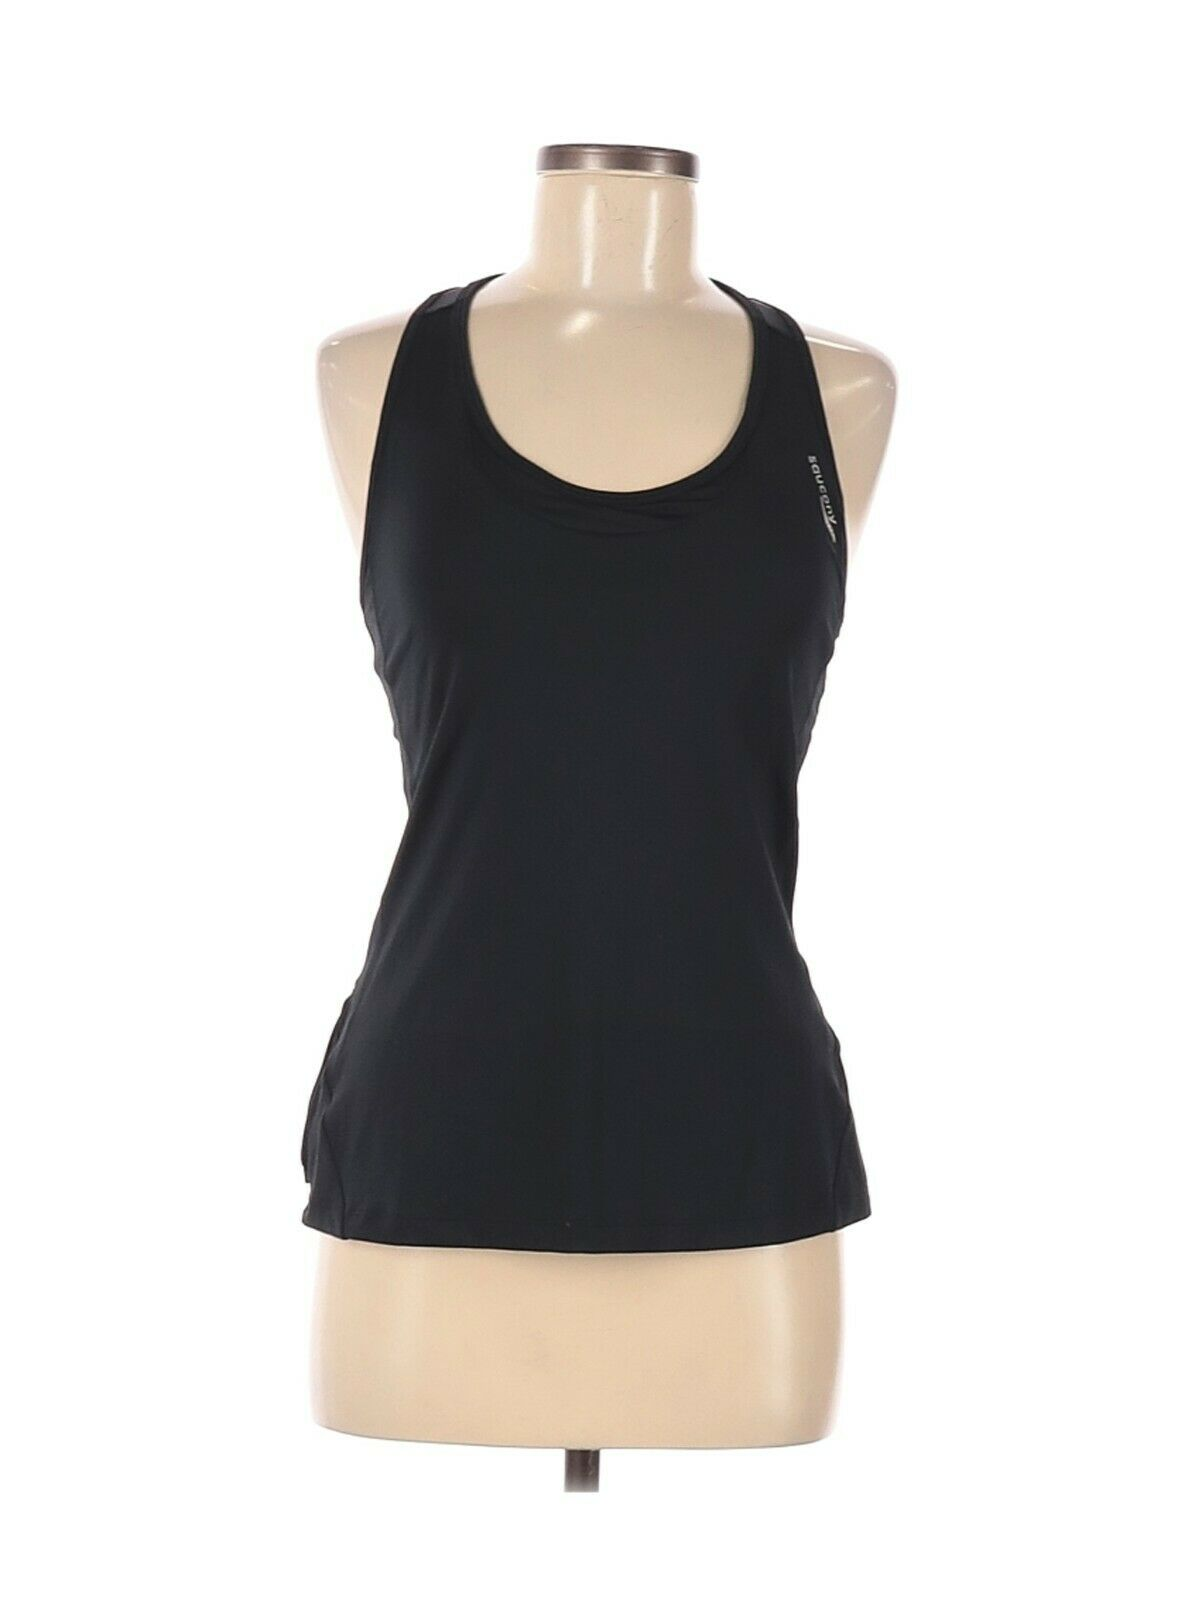 Saucony Black Athletic Tank Top with Build In Bra Women's Size Medium w 1 Pocket